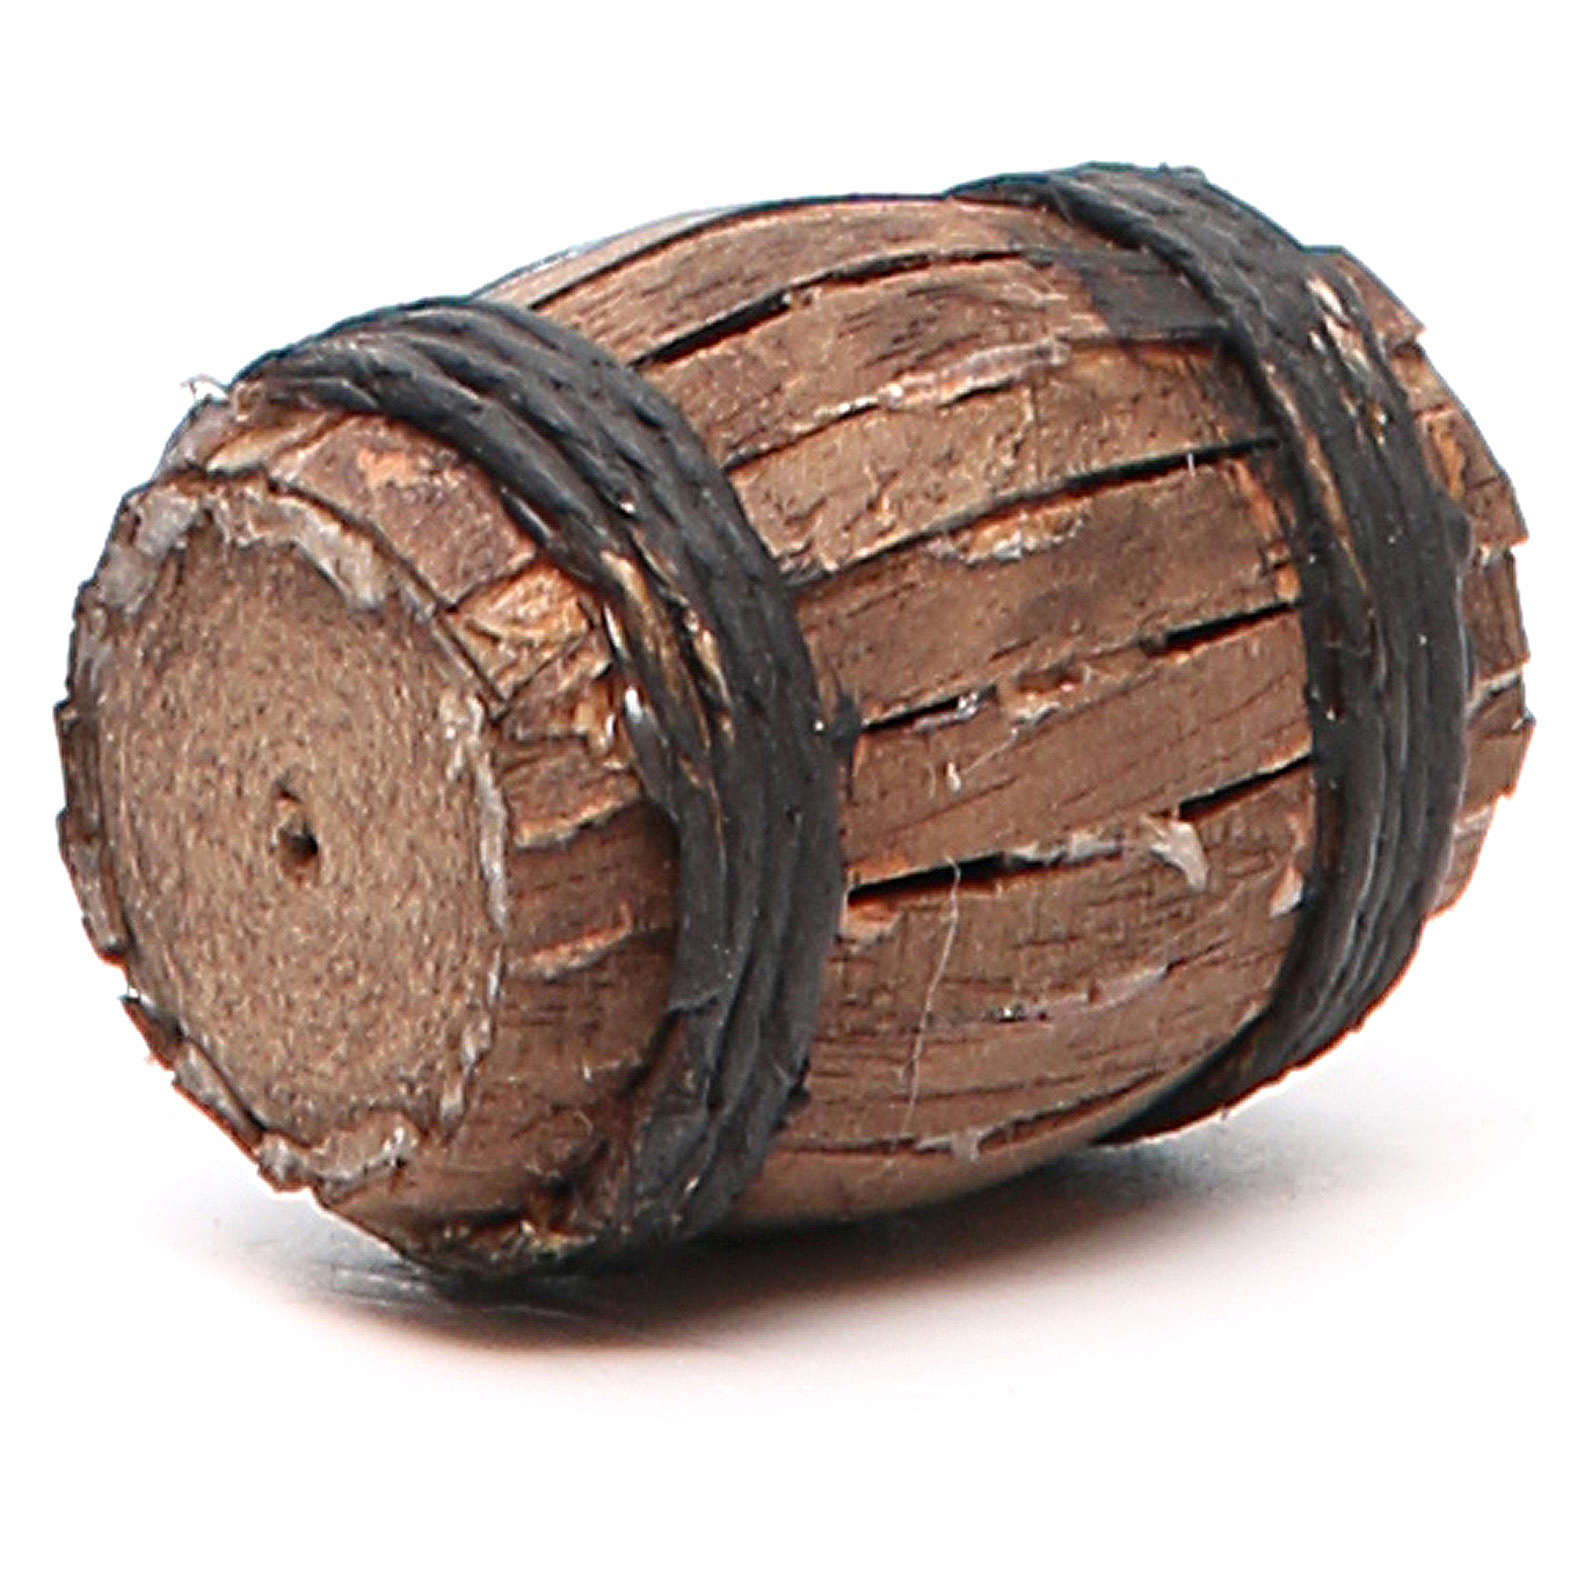 Barrel 4cm neapolitan Nativity 4